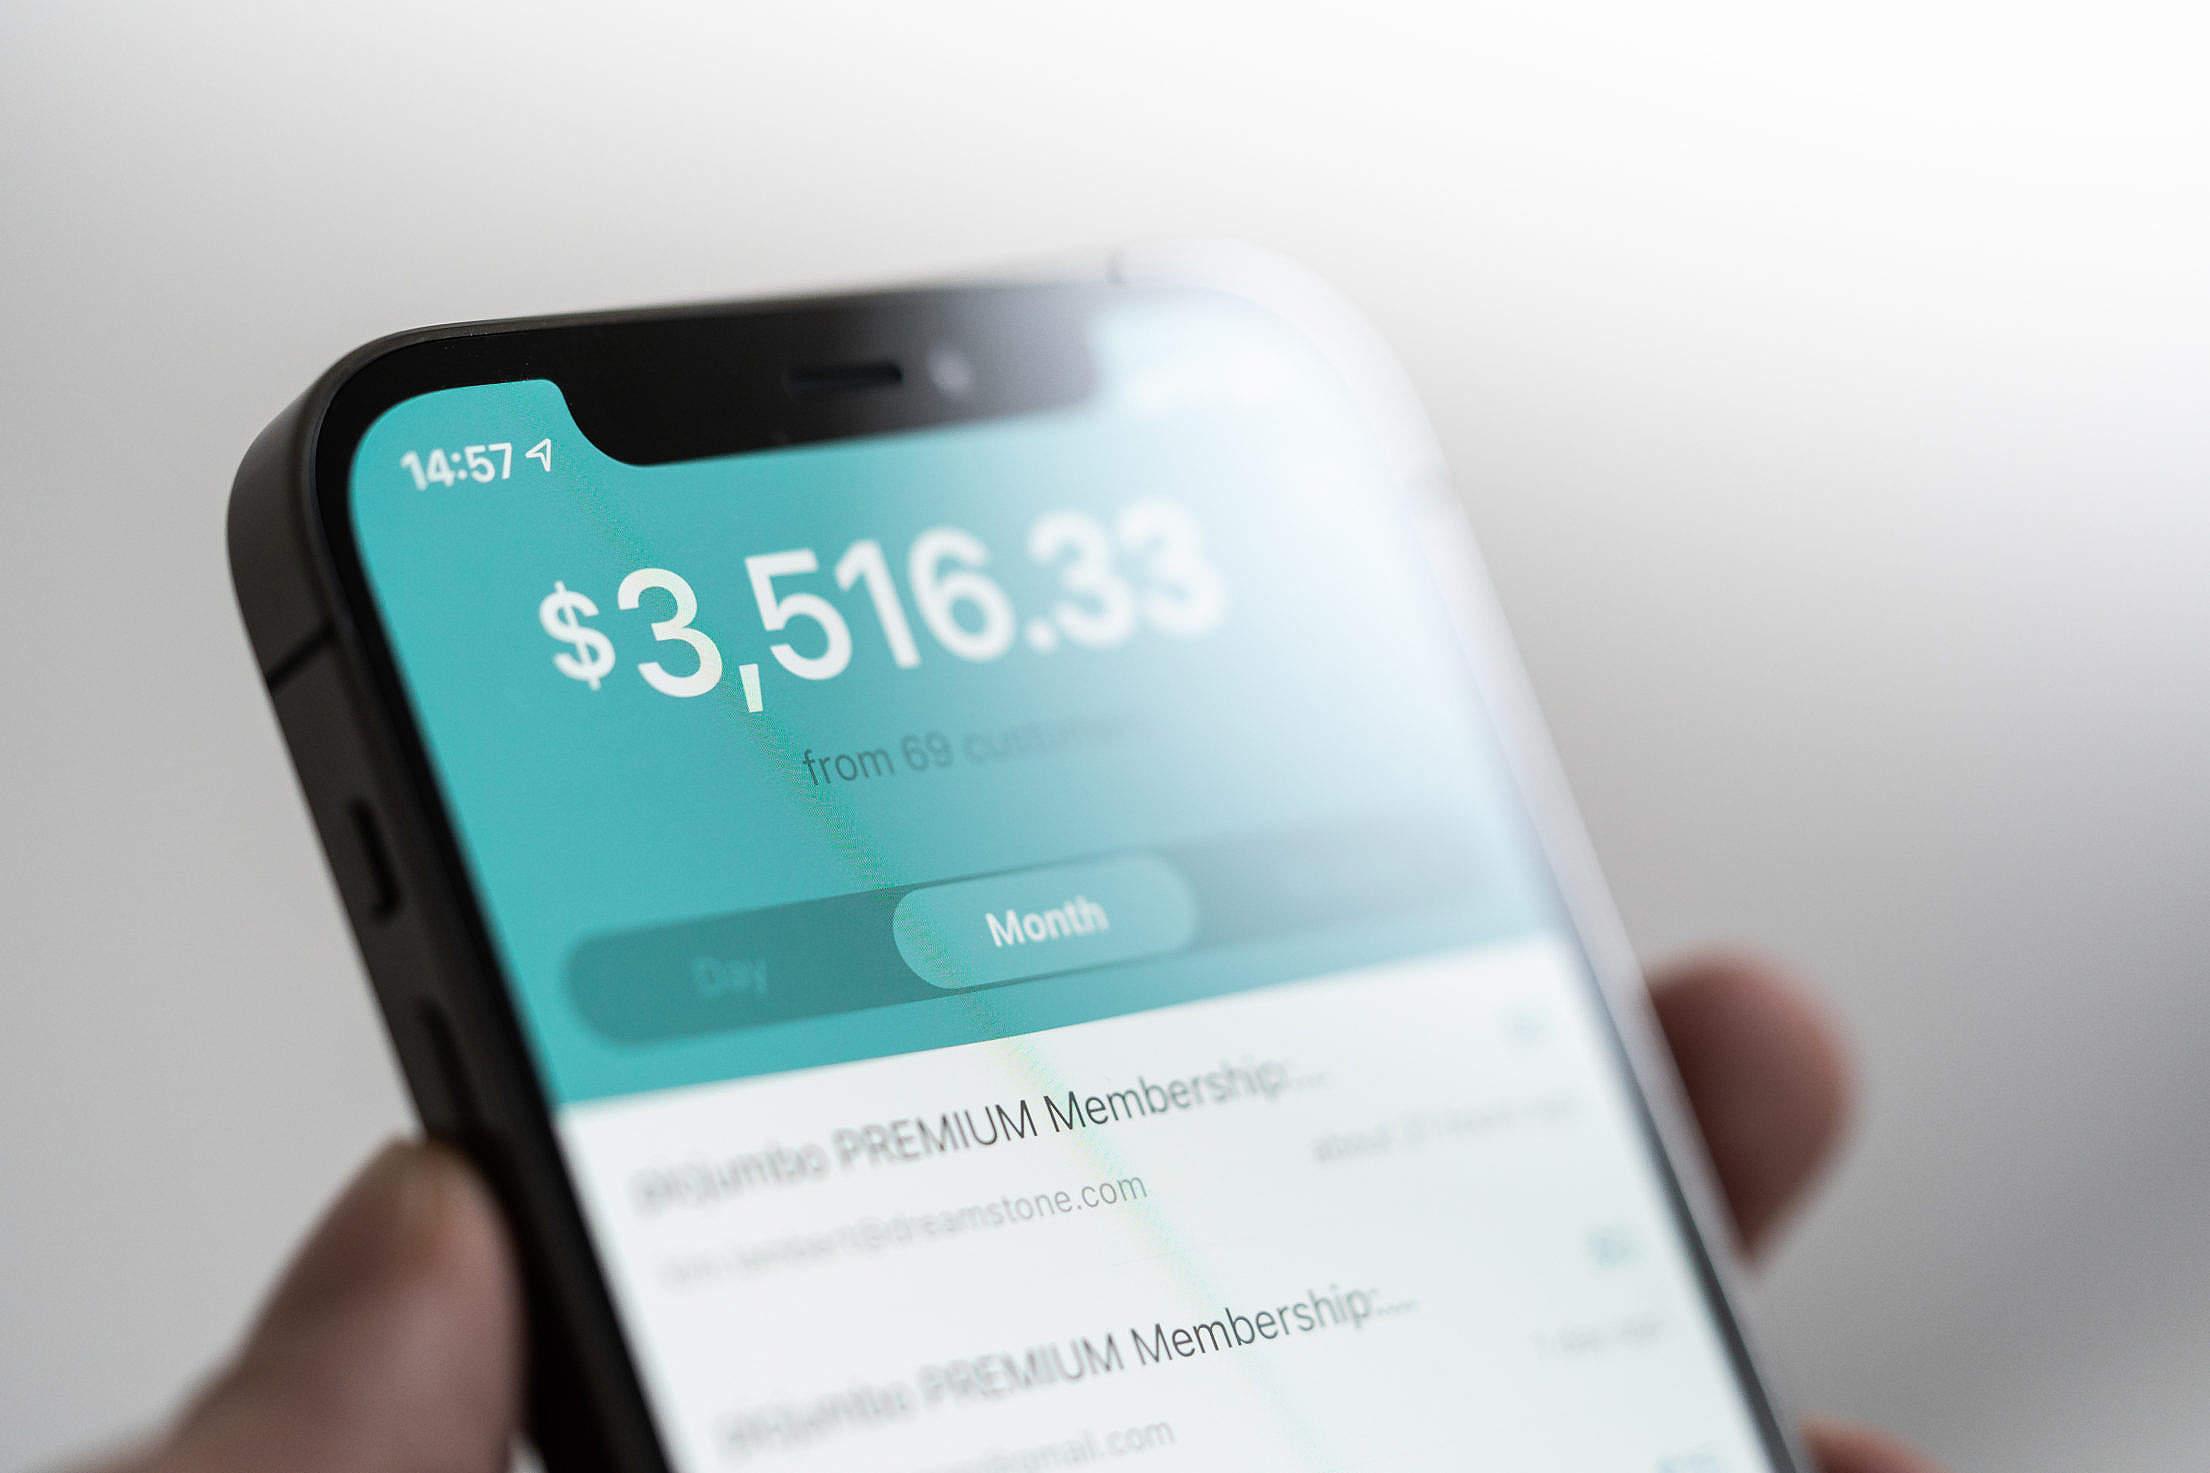 Gumroad Dashboard App Online Selling Digital Goods Free Stock Photo